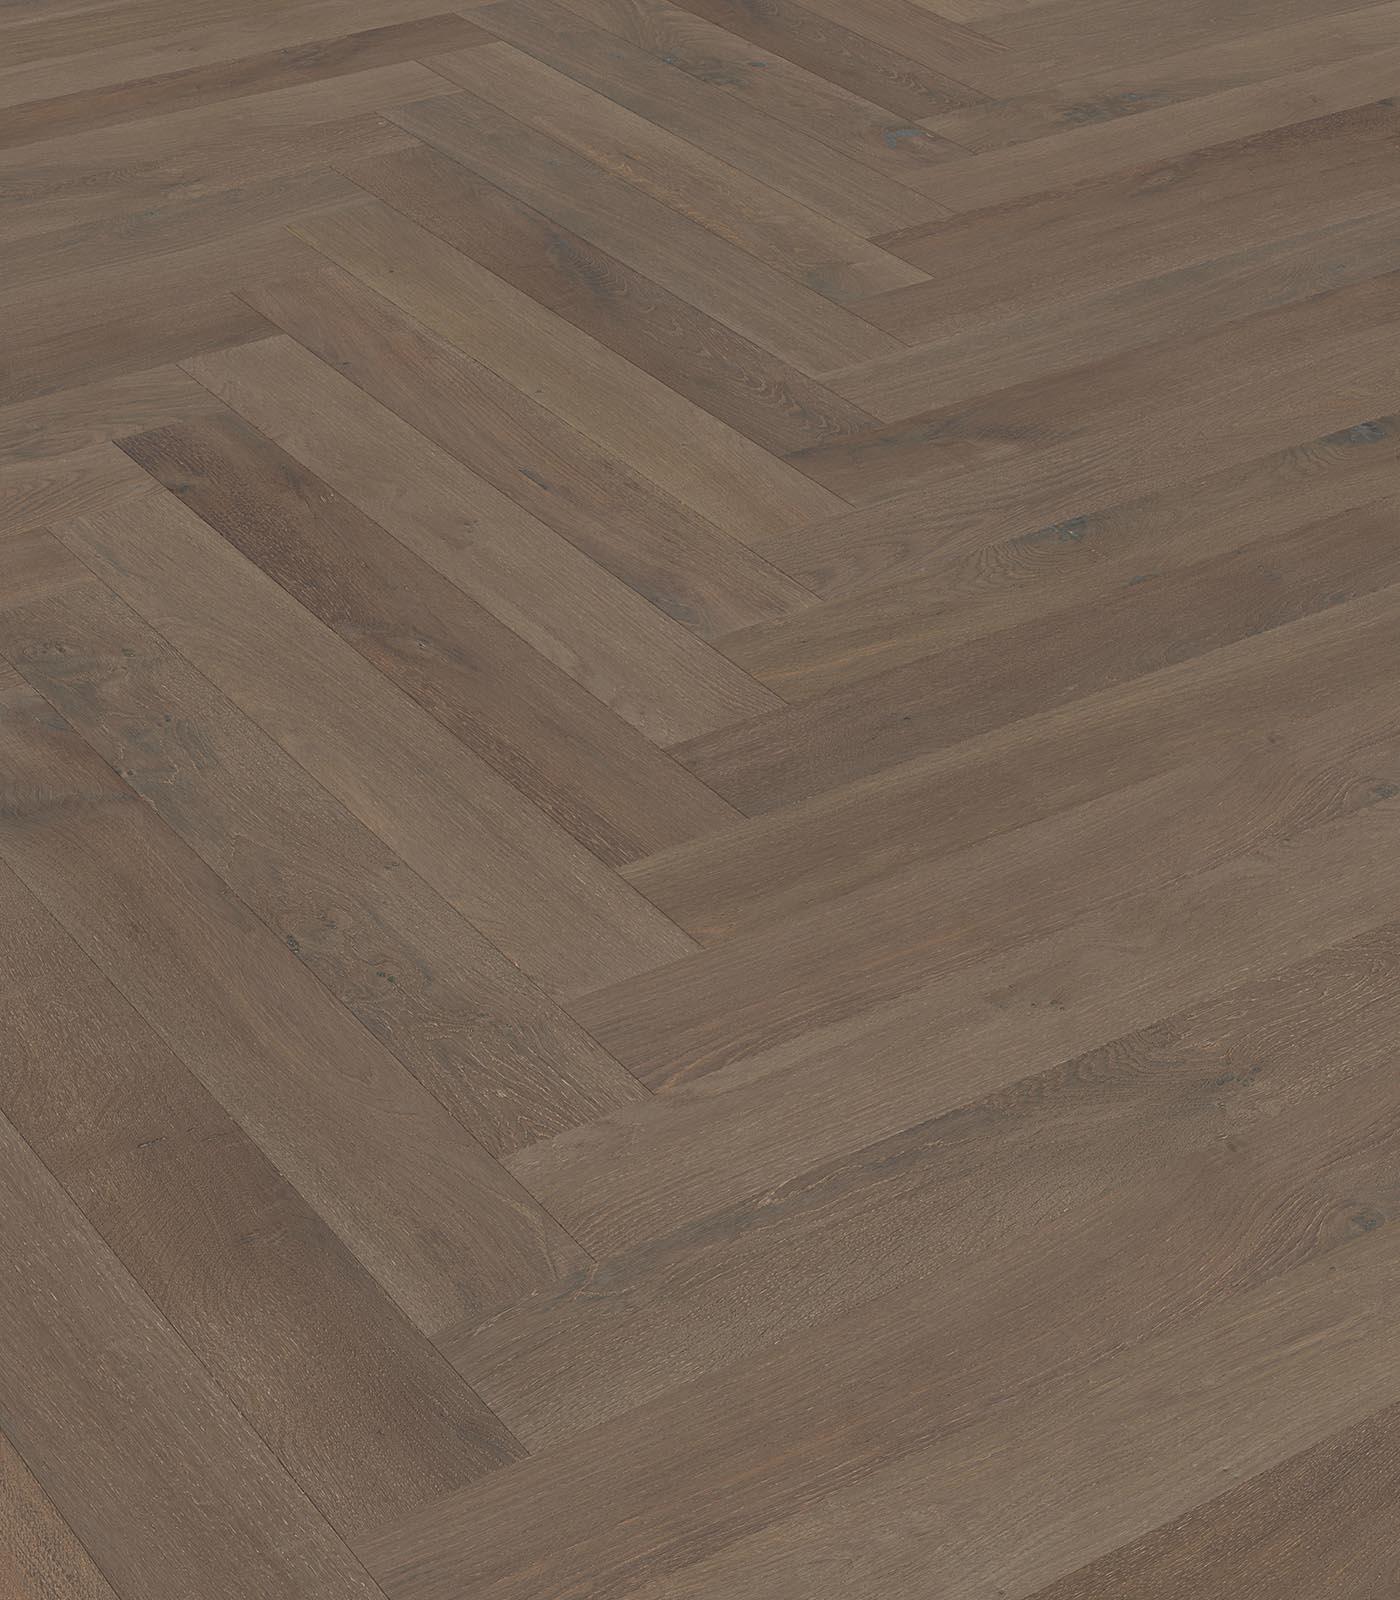 European Herringbone Oak Floors-Brittany-Fashion Collection-angle